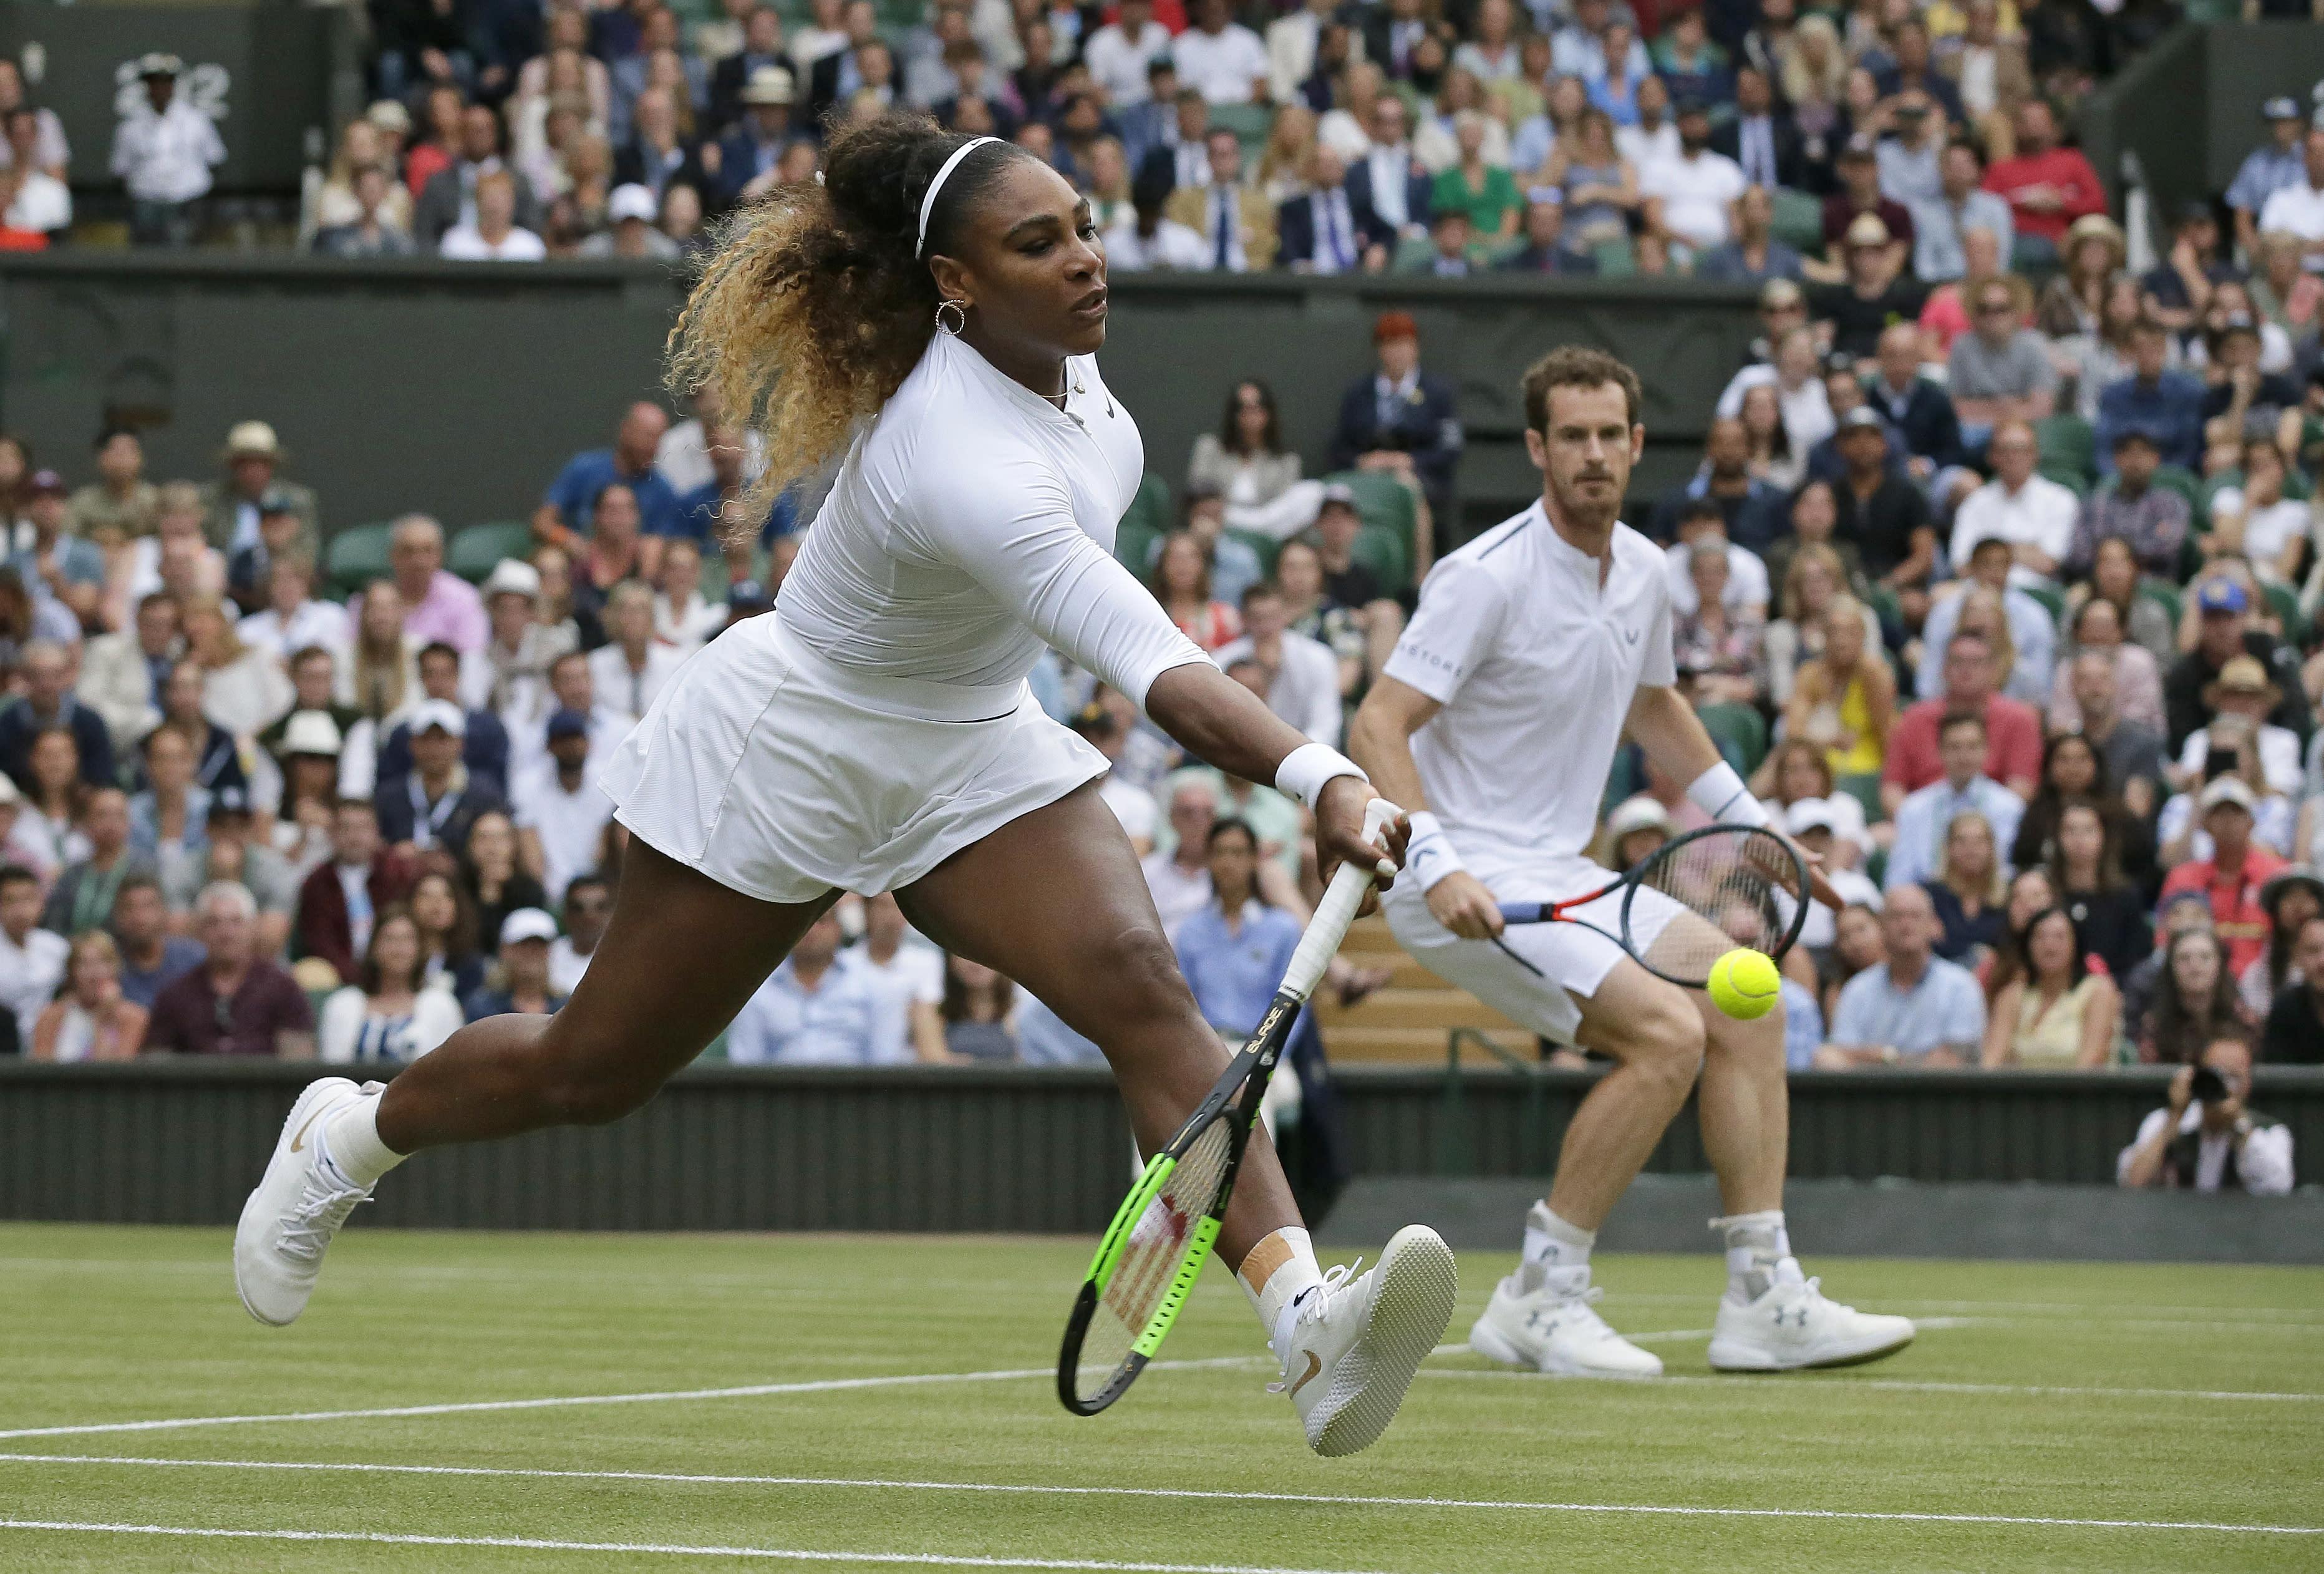 Gauff loses at Wimbledon, while Williams wins again